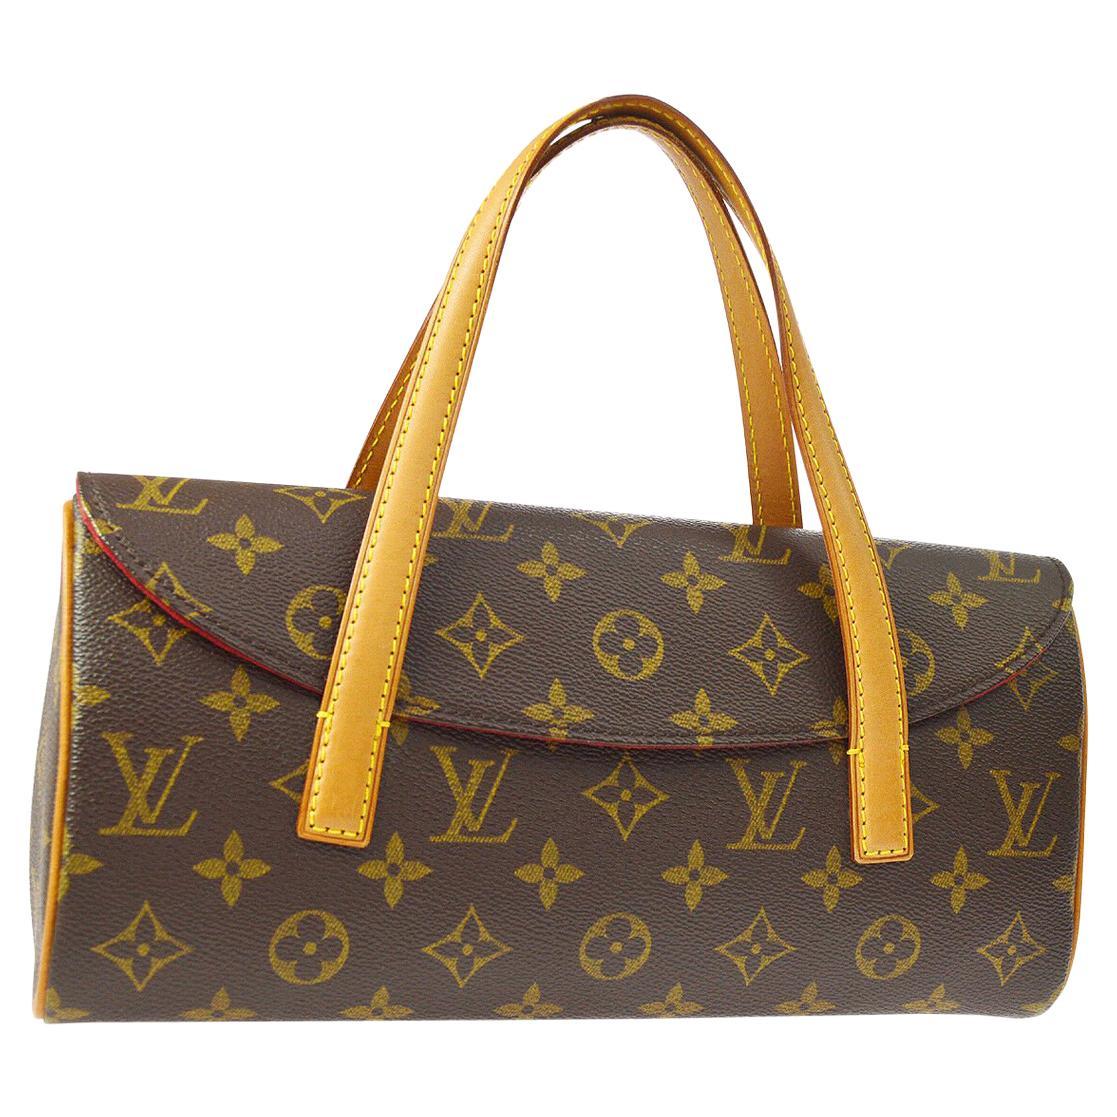 Louis Vuitton Monogram Brown Top Handle Satchel Kelly Style Evening Flap Bag